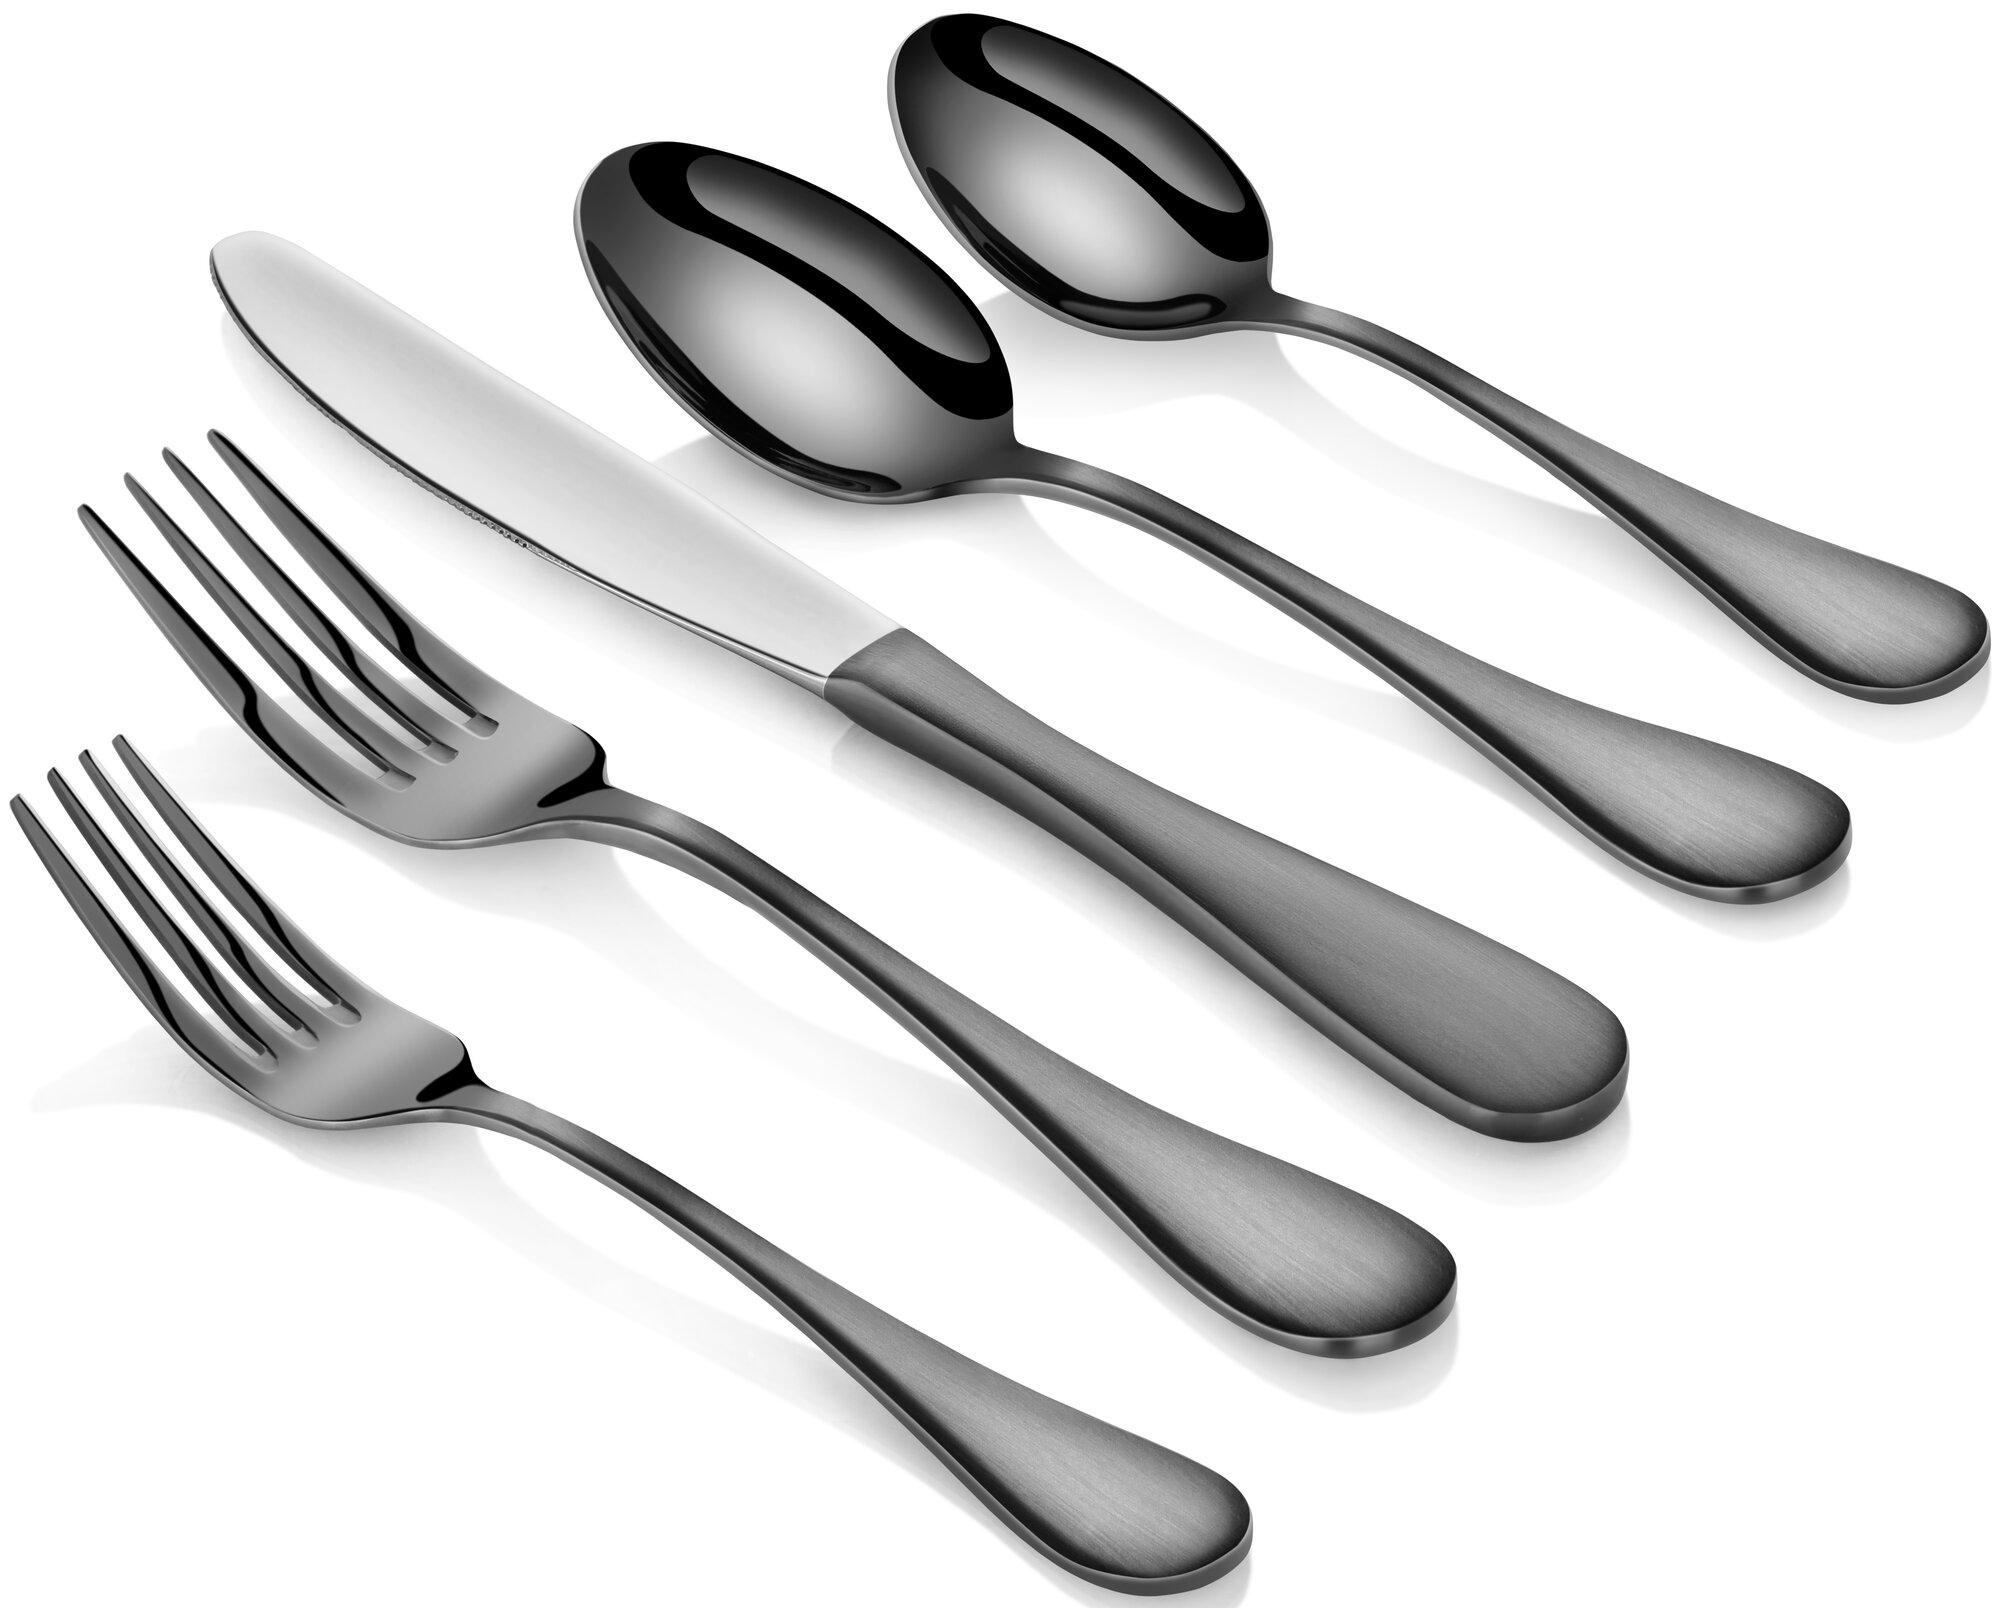 Artaste rain 20 piece stainless steel flatware set ebay